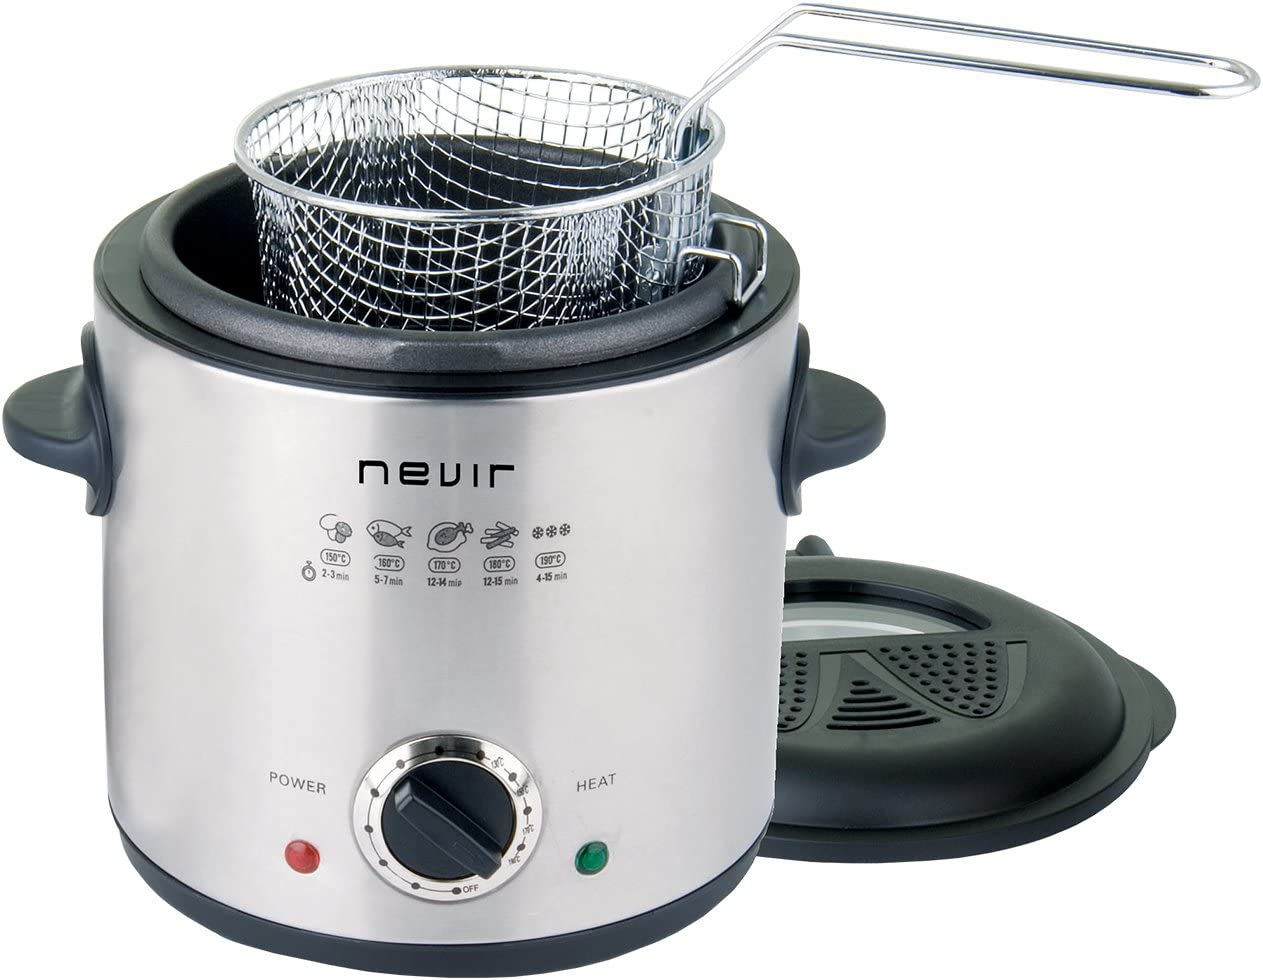 Nevir NVR-6516 F Solo Independiente 1L 900W Negro, Acero inoxidable - Freidora (1 L, 130 °C, 190 °C, Solo, Negro, Acero inoxidable, Giratorio): Amazon.es: Hogar